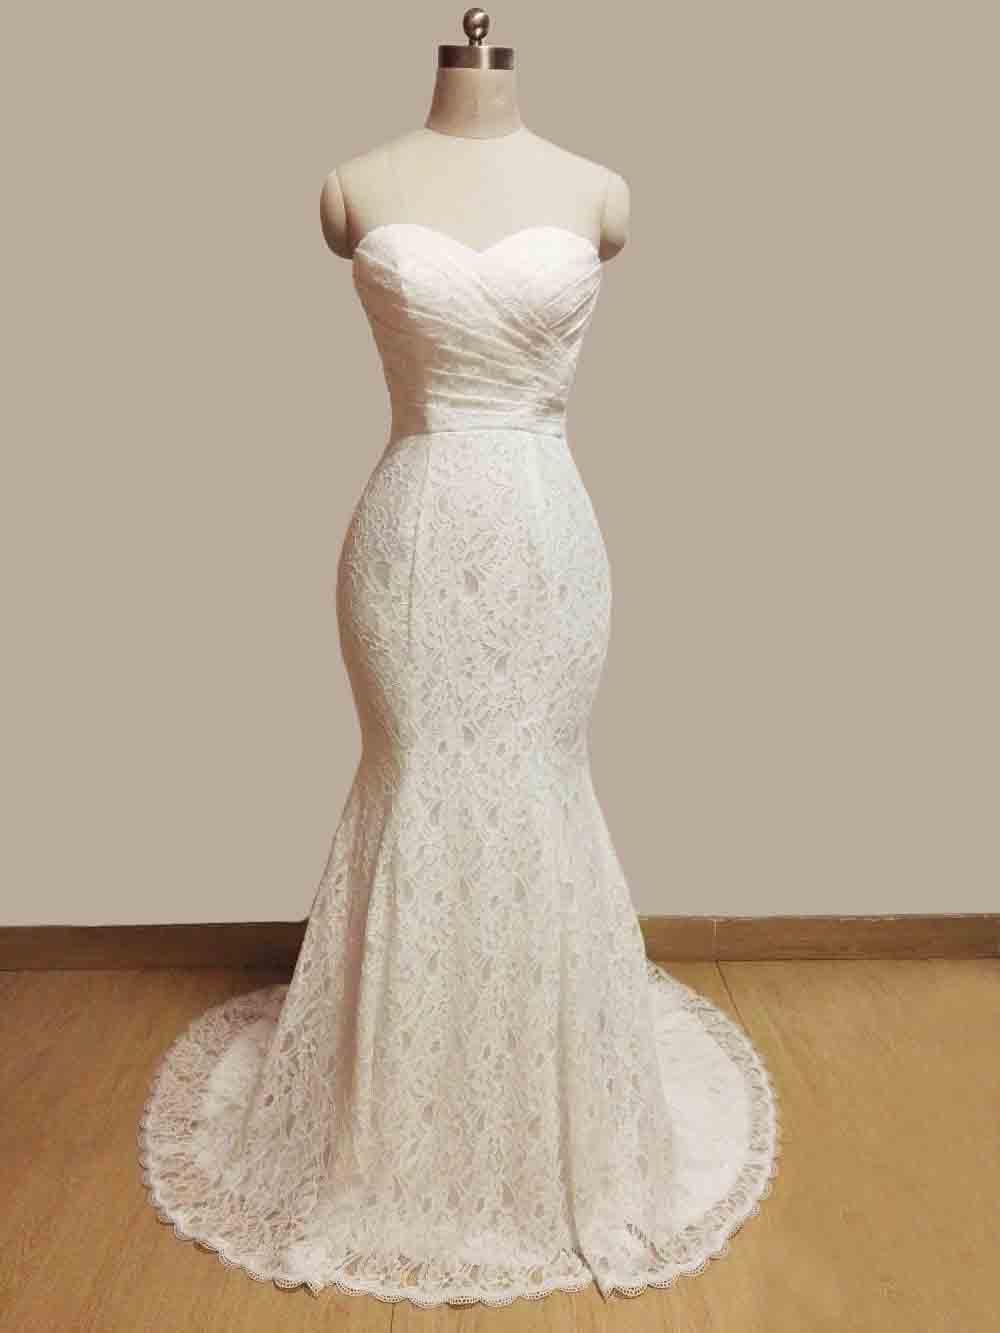 JIERUIZE vestidos de novia White Lace Mermaid Wedding Dresses 2017 Sash Sweetheart Lace Up Back Wedding Gowns abiti da sposa 4